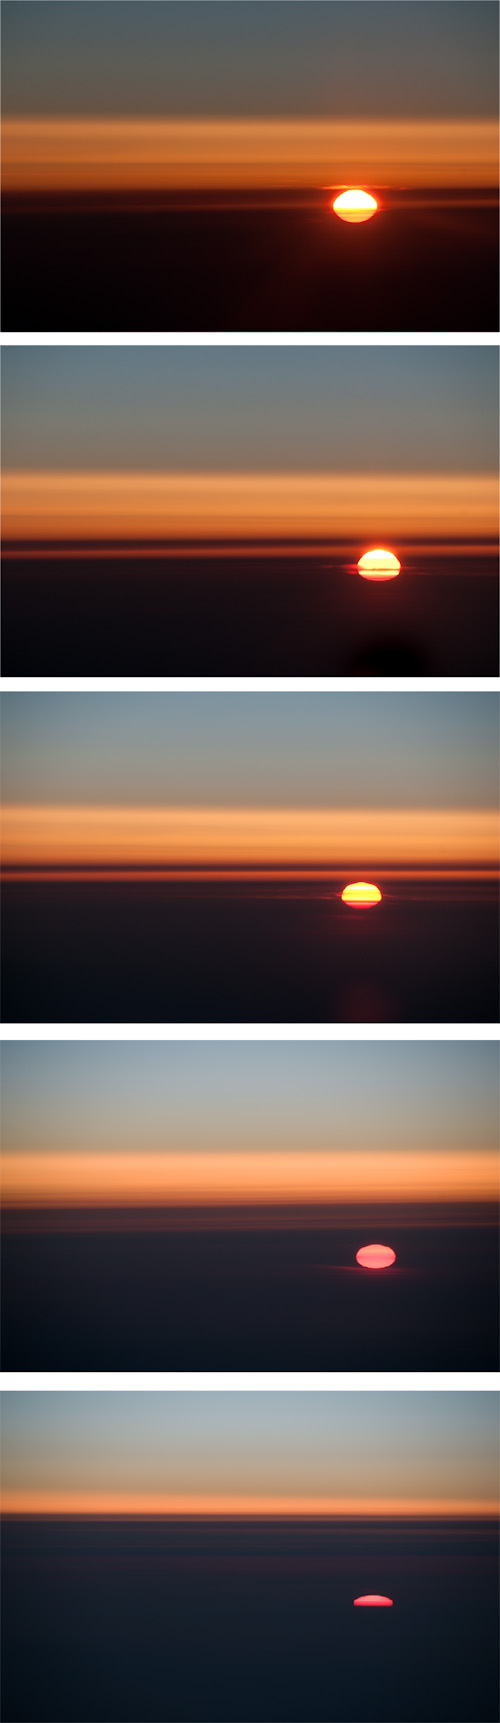 UK_airplane_sunset04272008_176-Edit